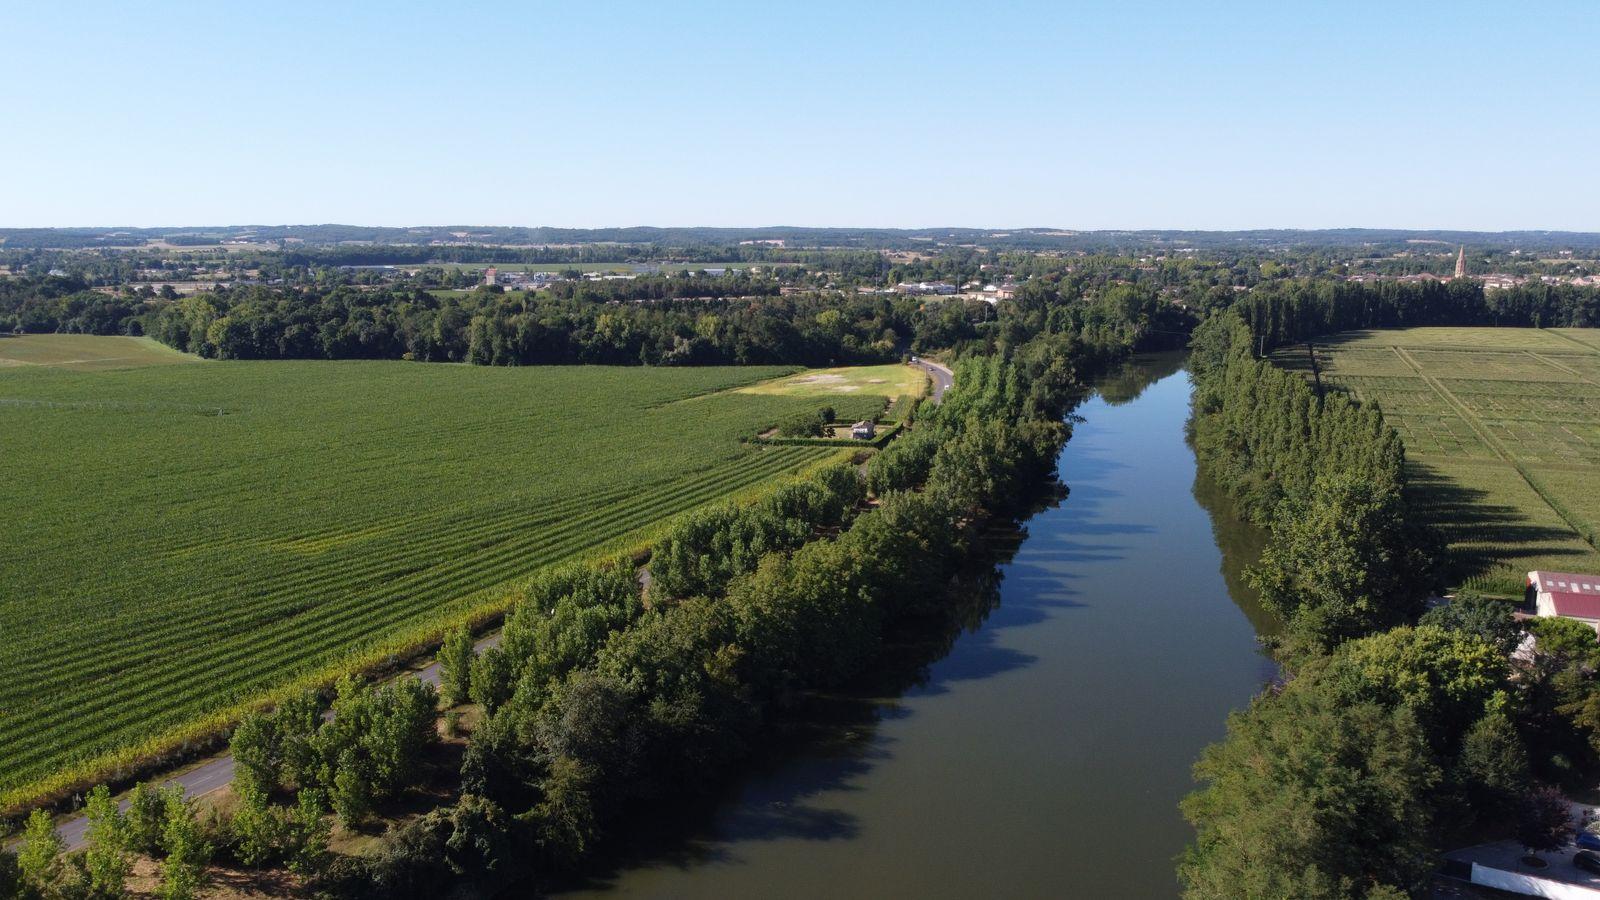 La rivière Aveyron